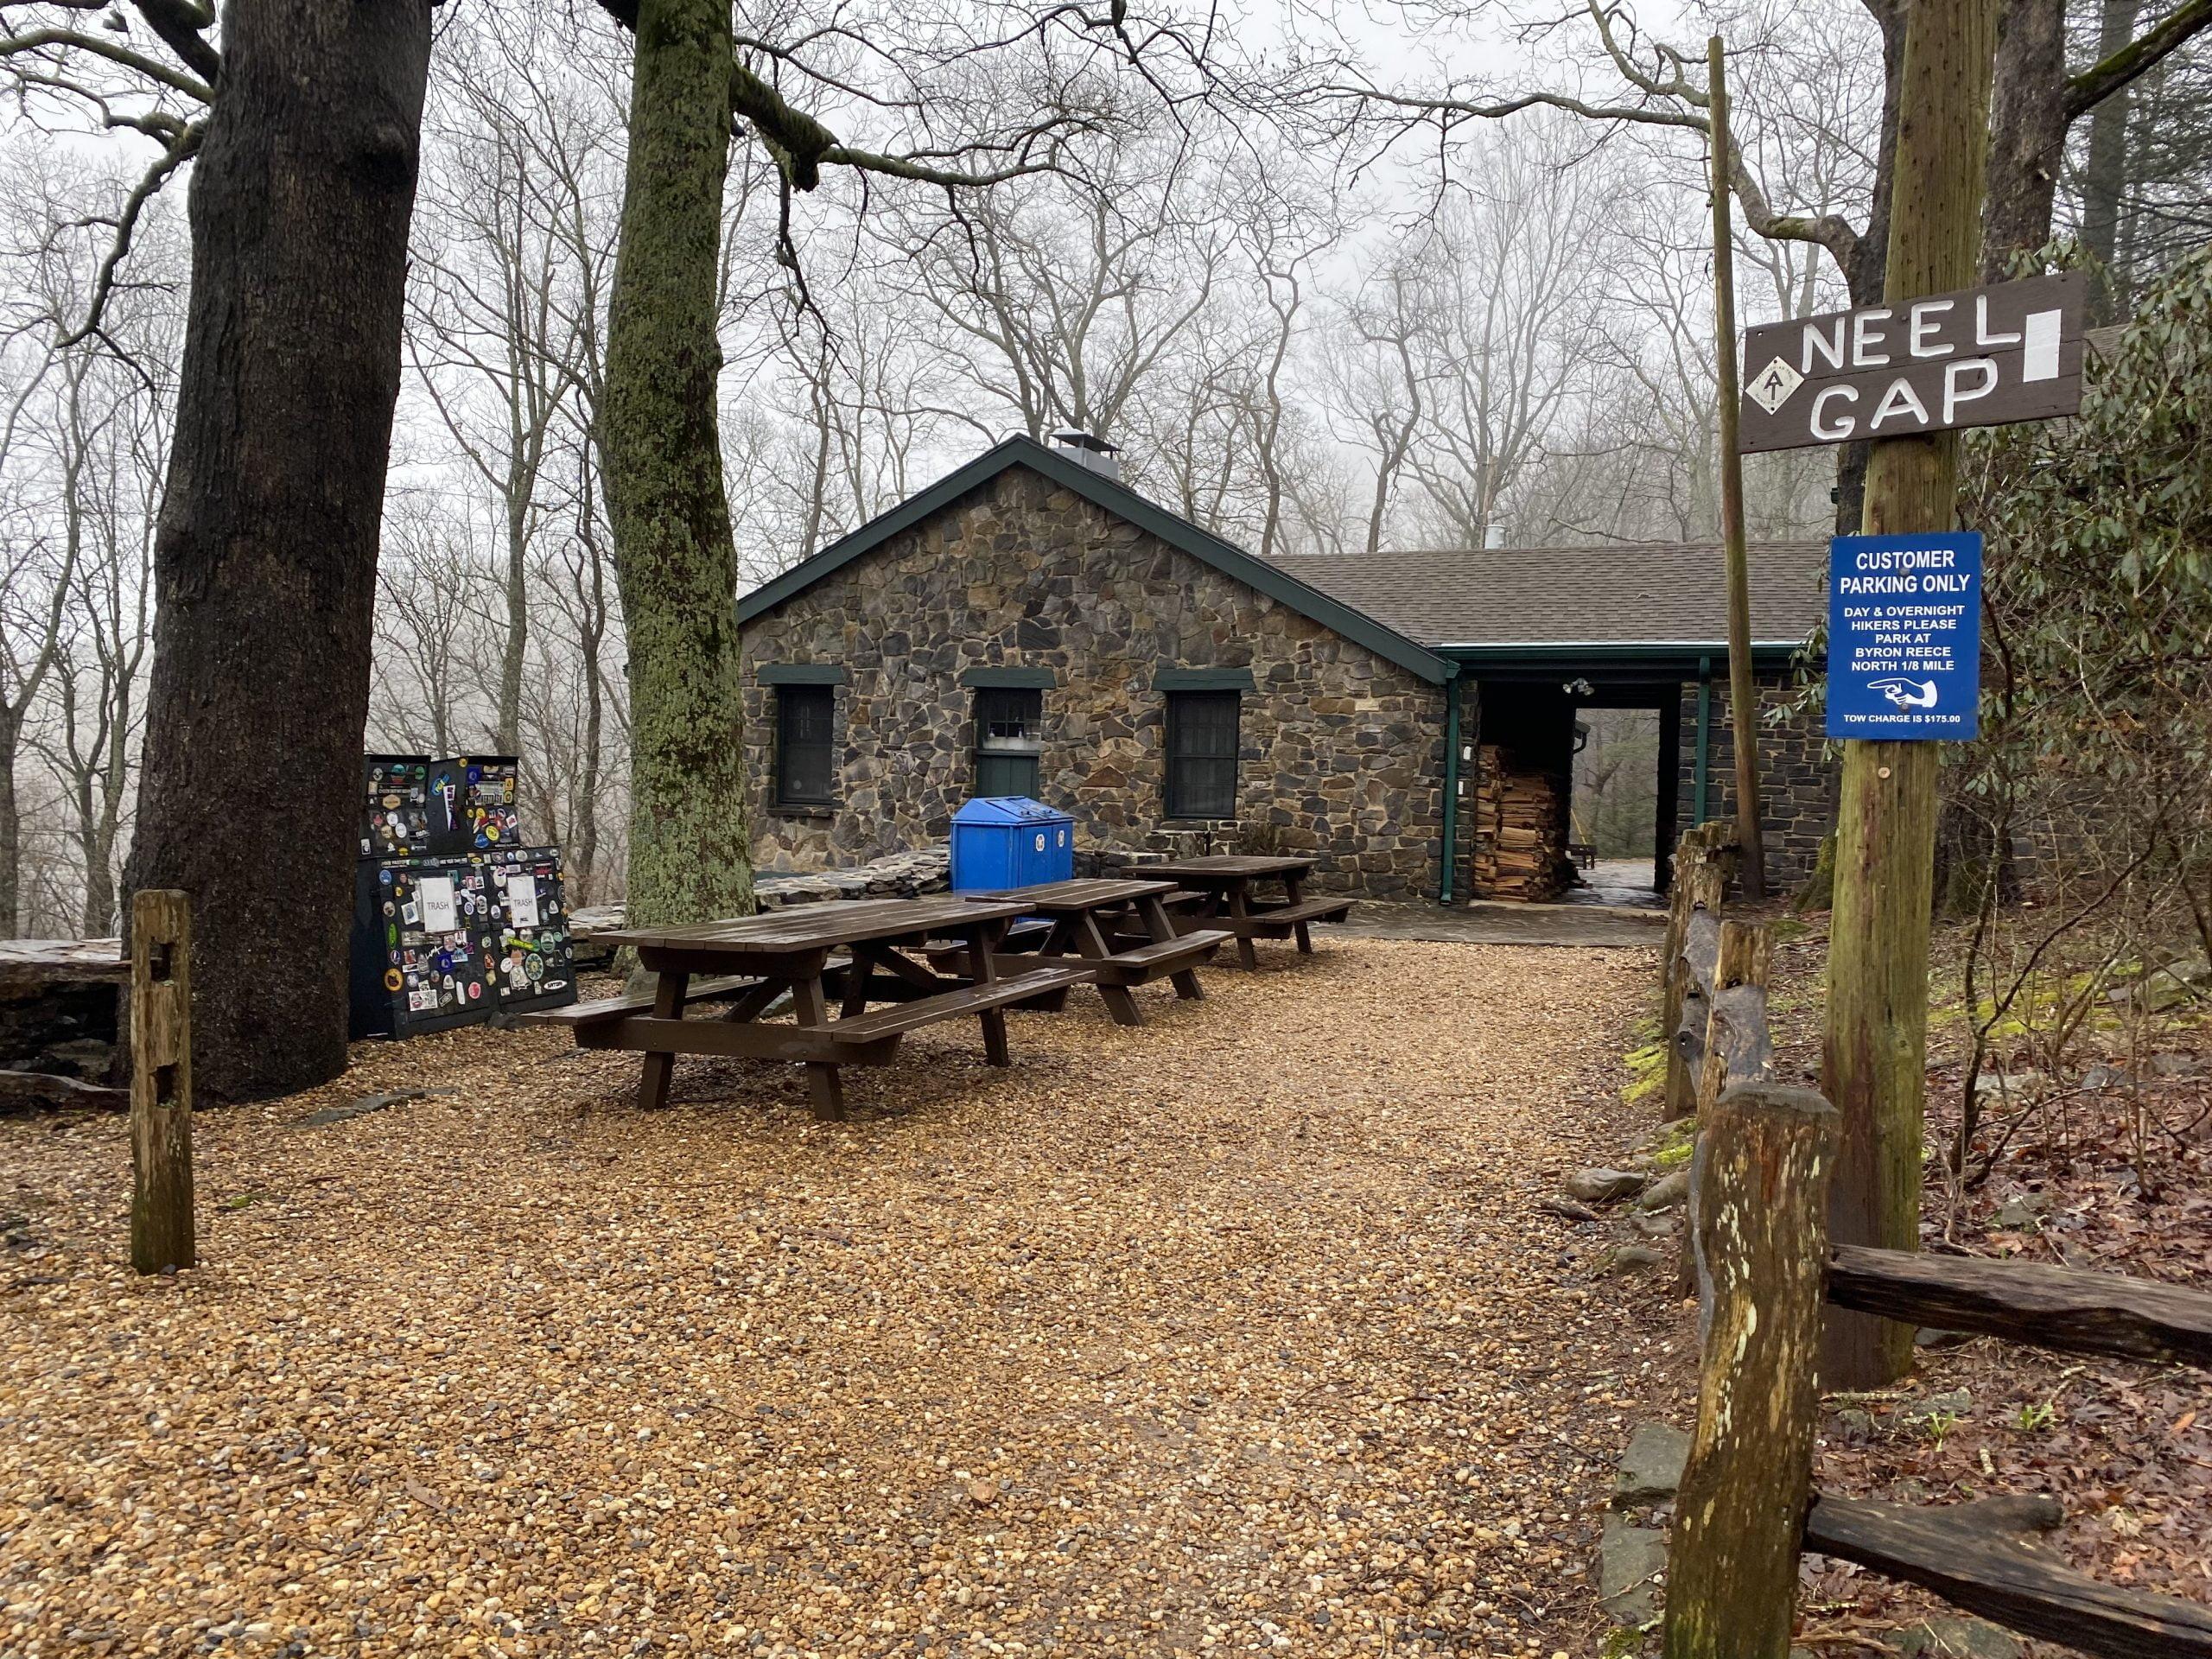 Day 7: Appalachian Trail Thru Hike | Neel Gap to Baggs Creek Gap